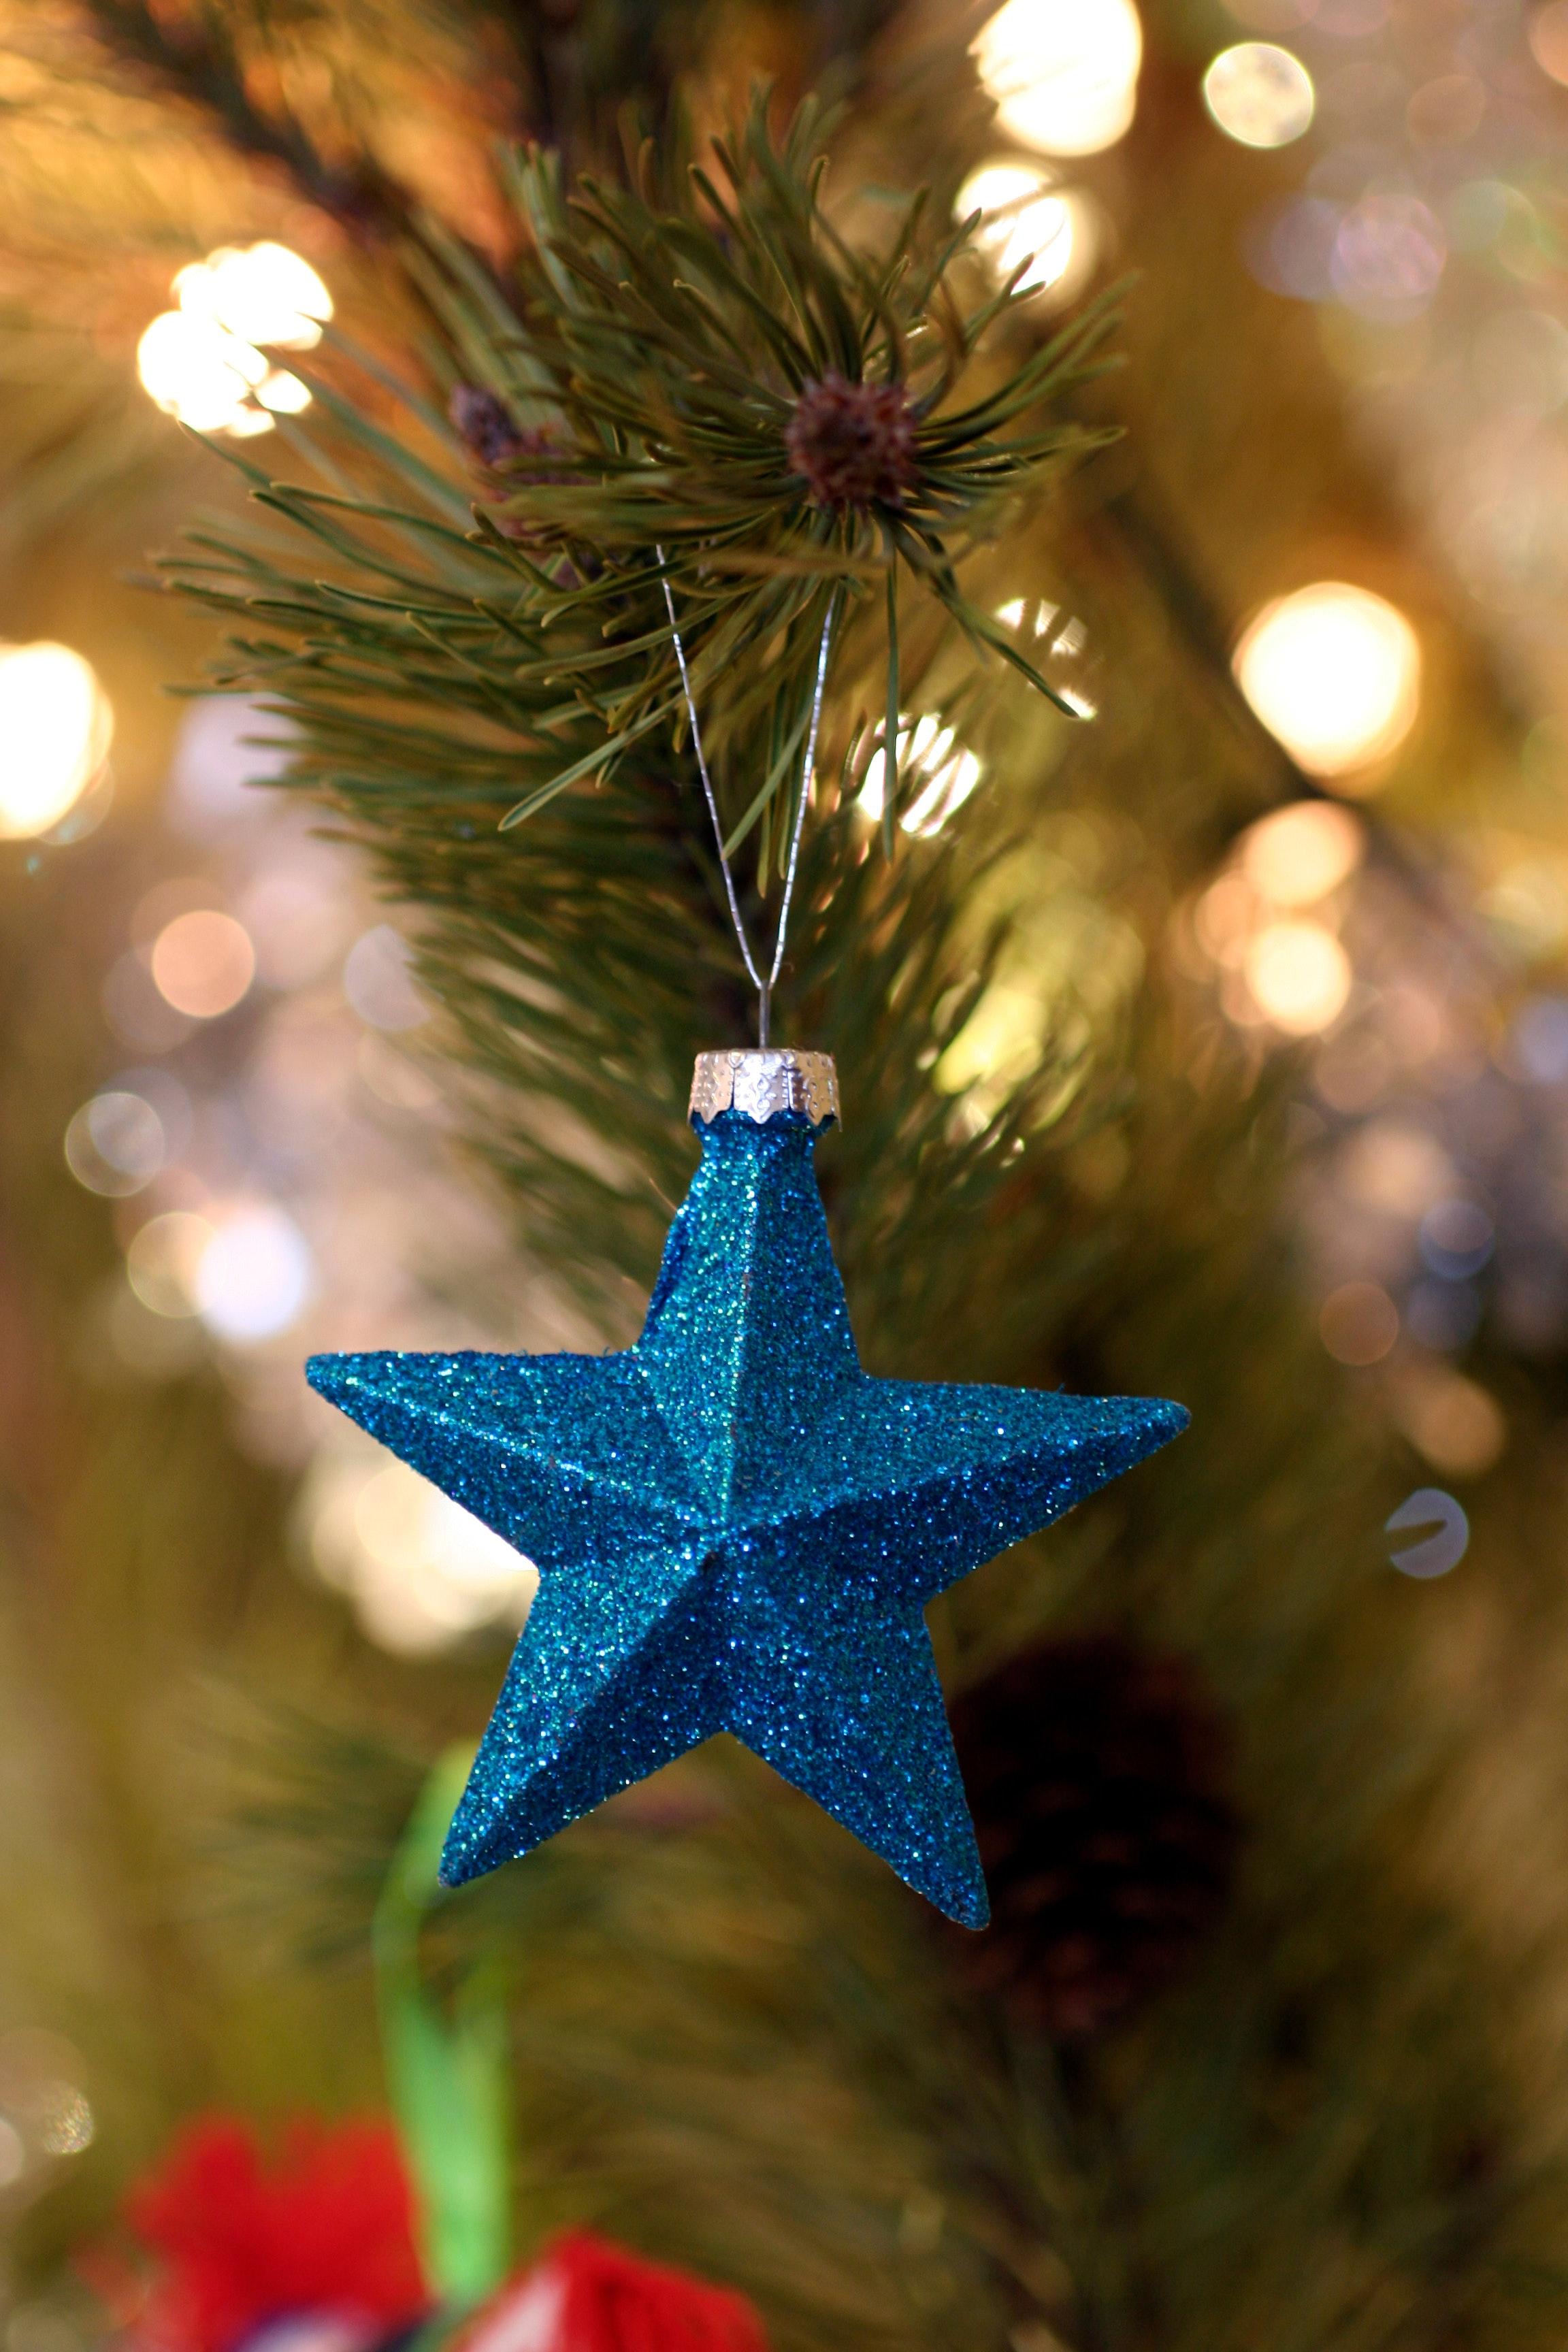 Shallow Focus Photography Of Blue Star Christmas Tree Decor Free Stock Photo